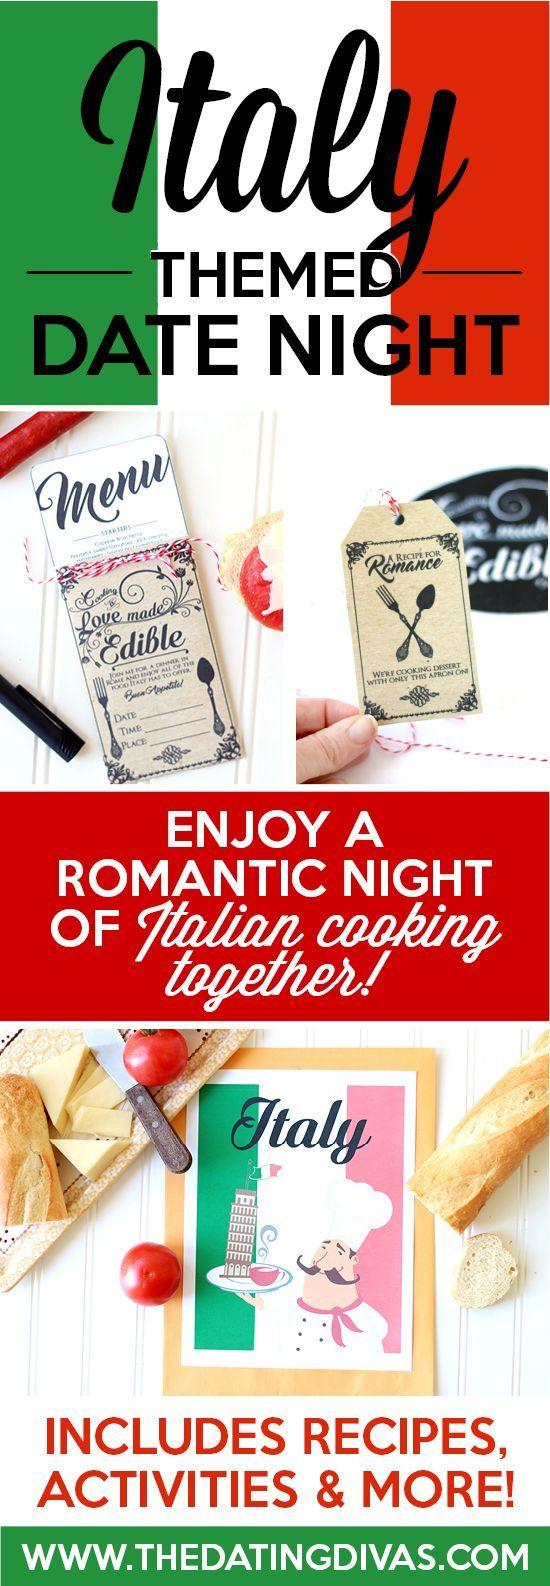 Italy Date Night - The Dating Divas